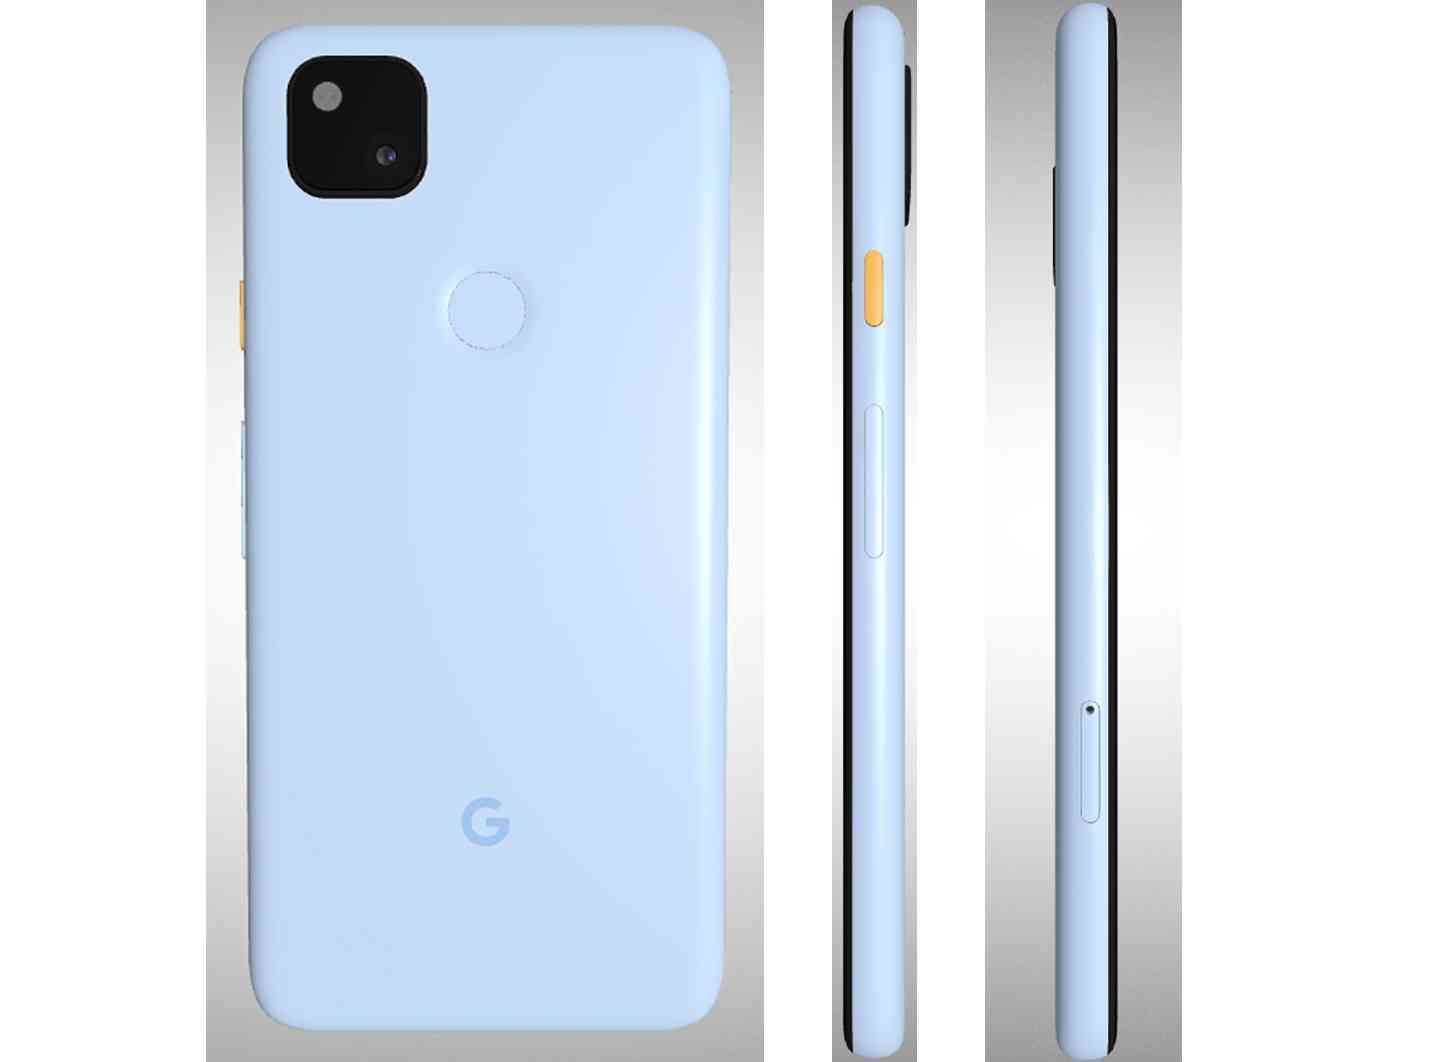 Google Pixel 4a Barely Blue color